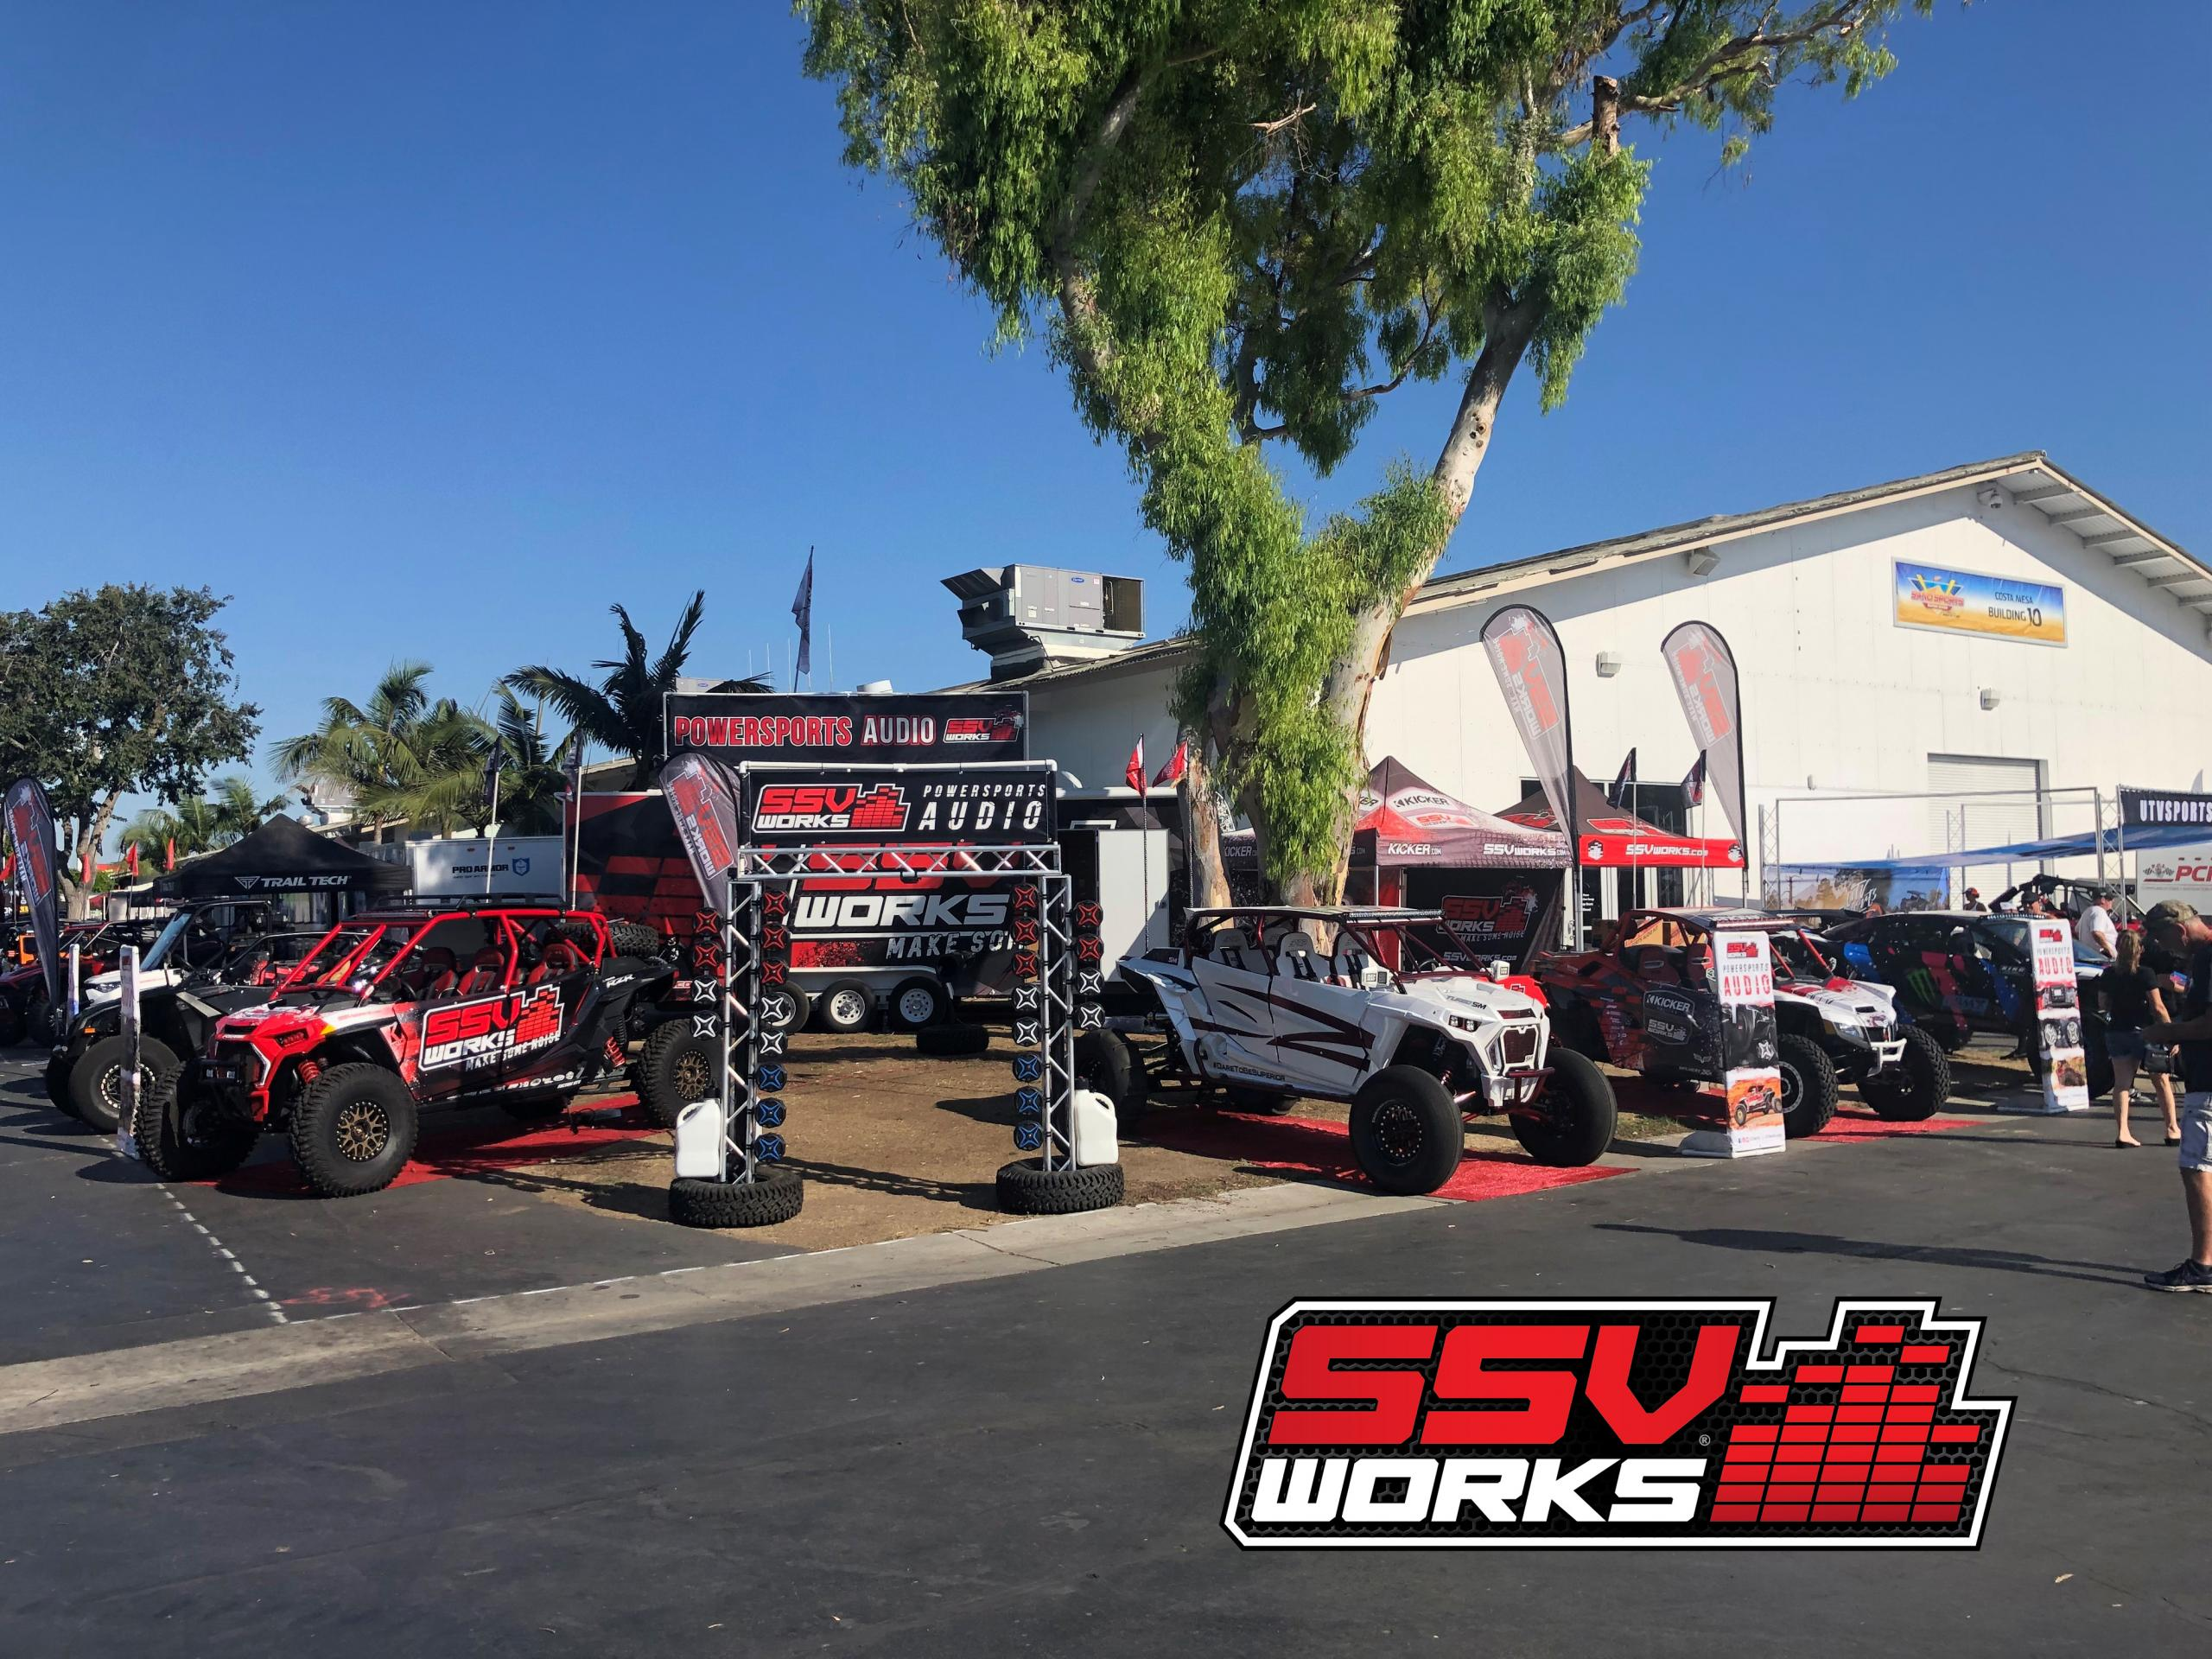 SSV Works Sand Sports Super Show 2021